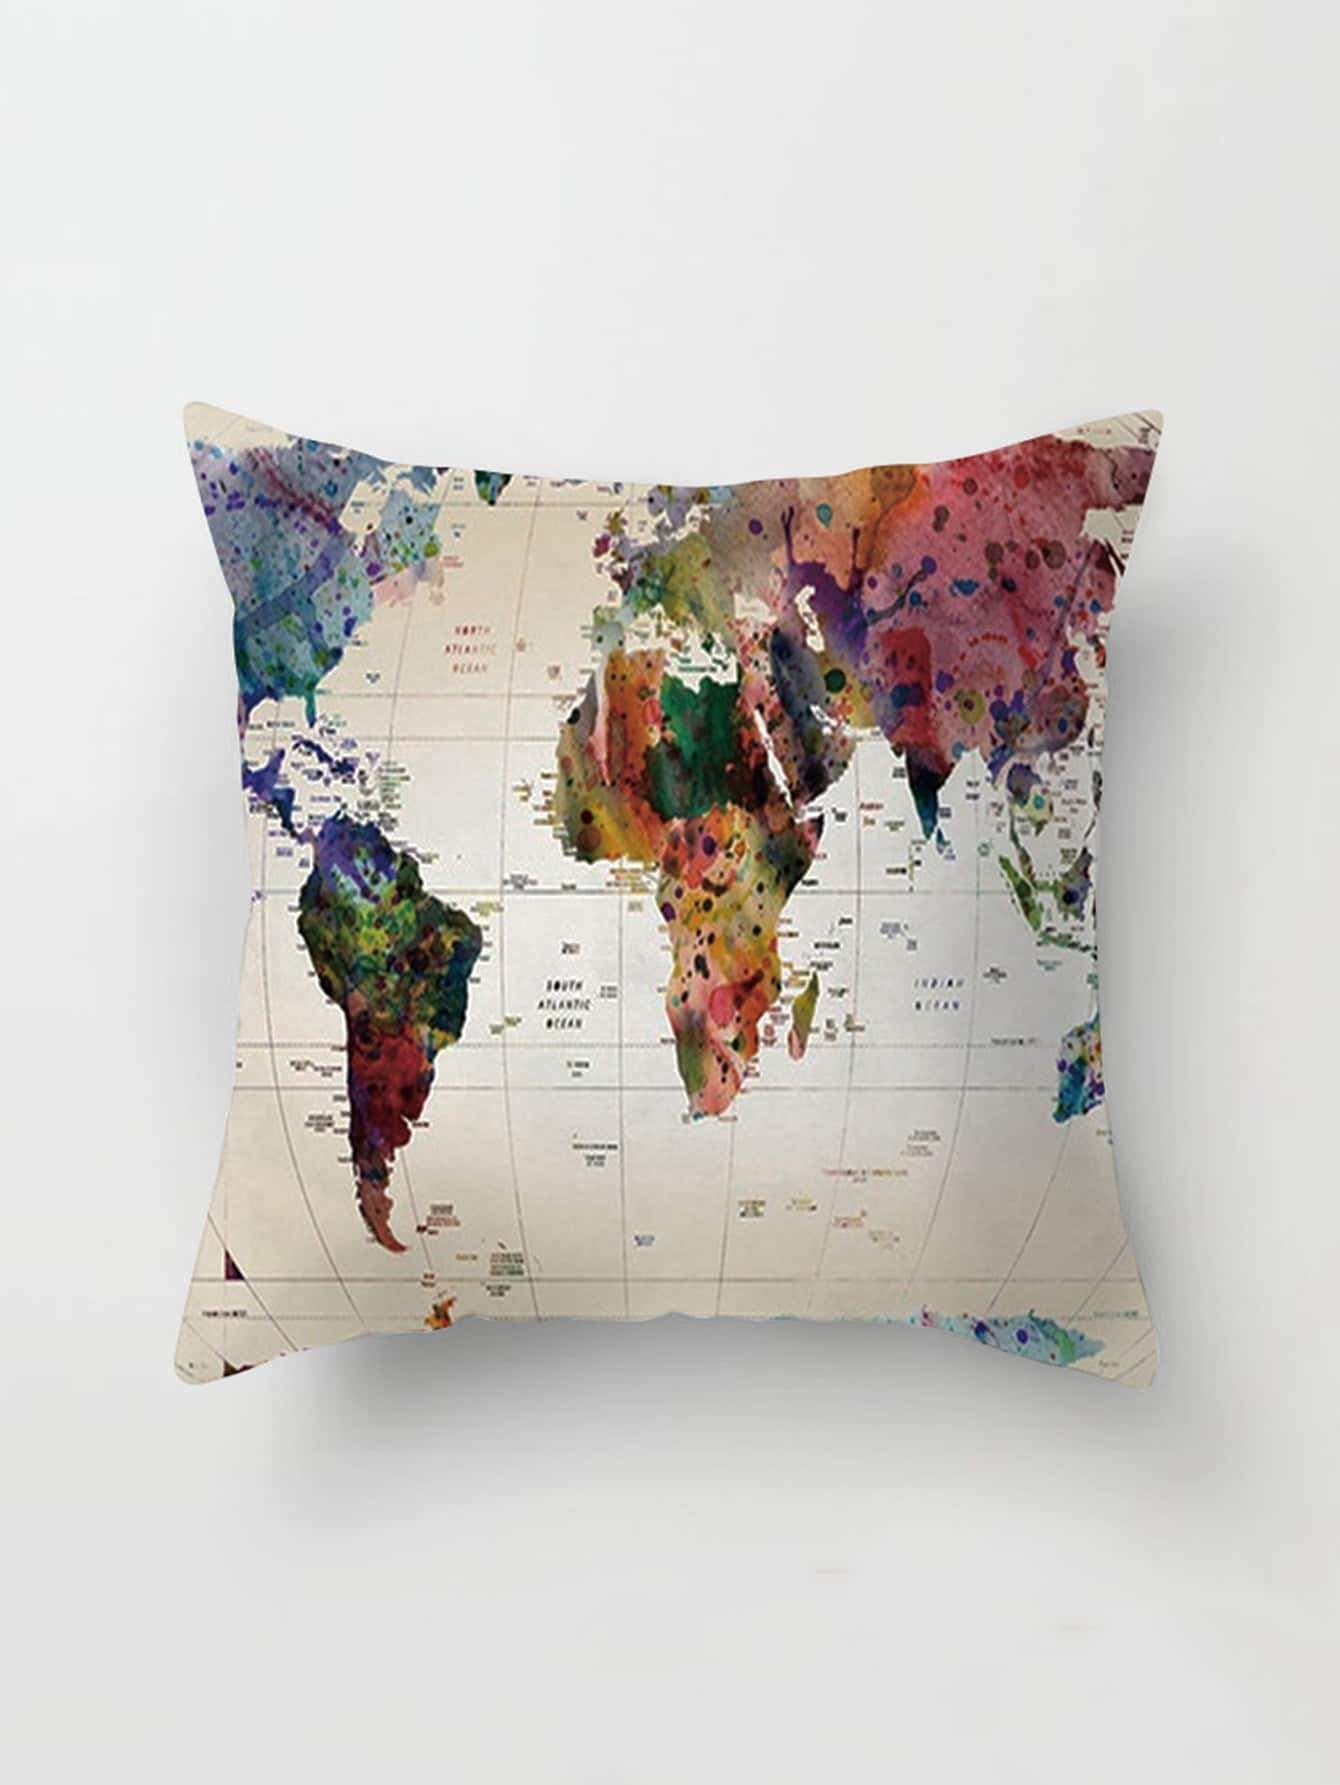 Map Print Pillowcase Cover  9.00  homefurnishings  decor  homedecor   furniture  furnishings  home 001d9ac89f